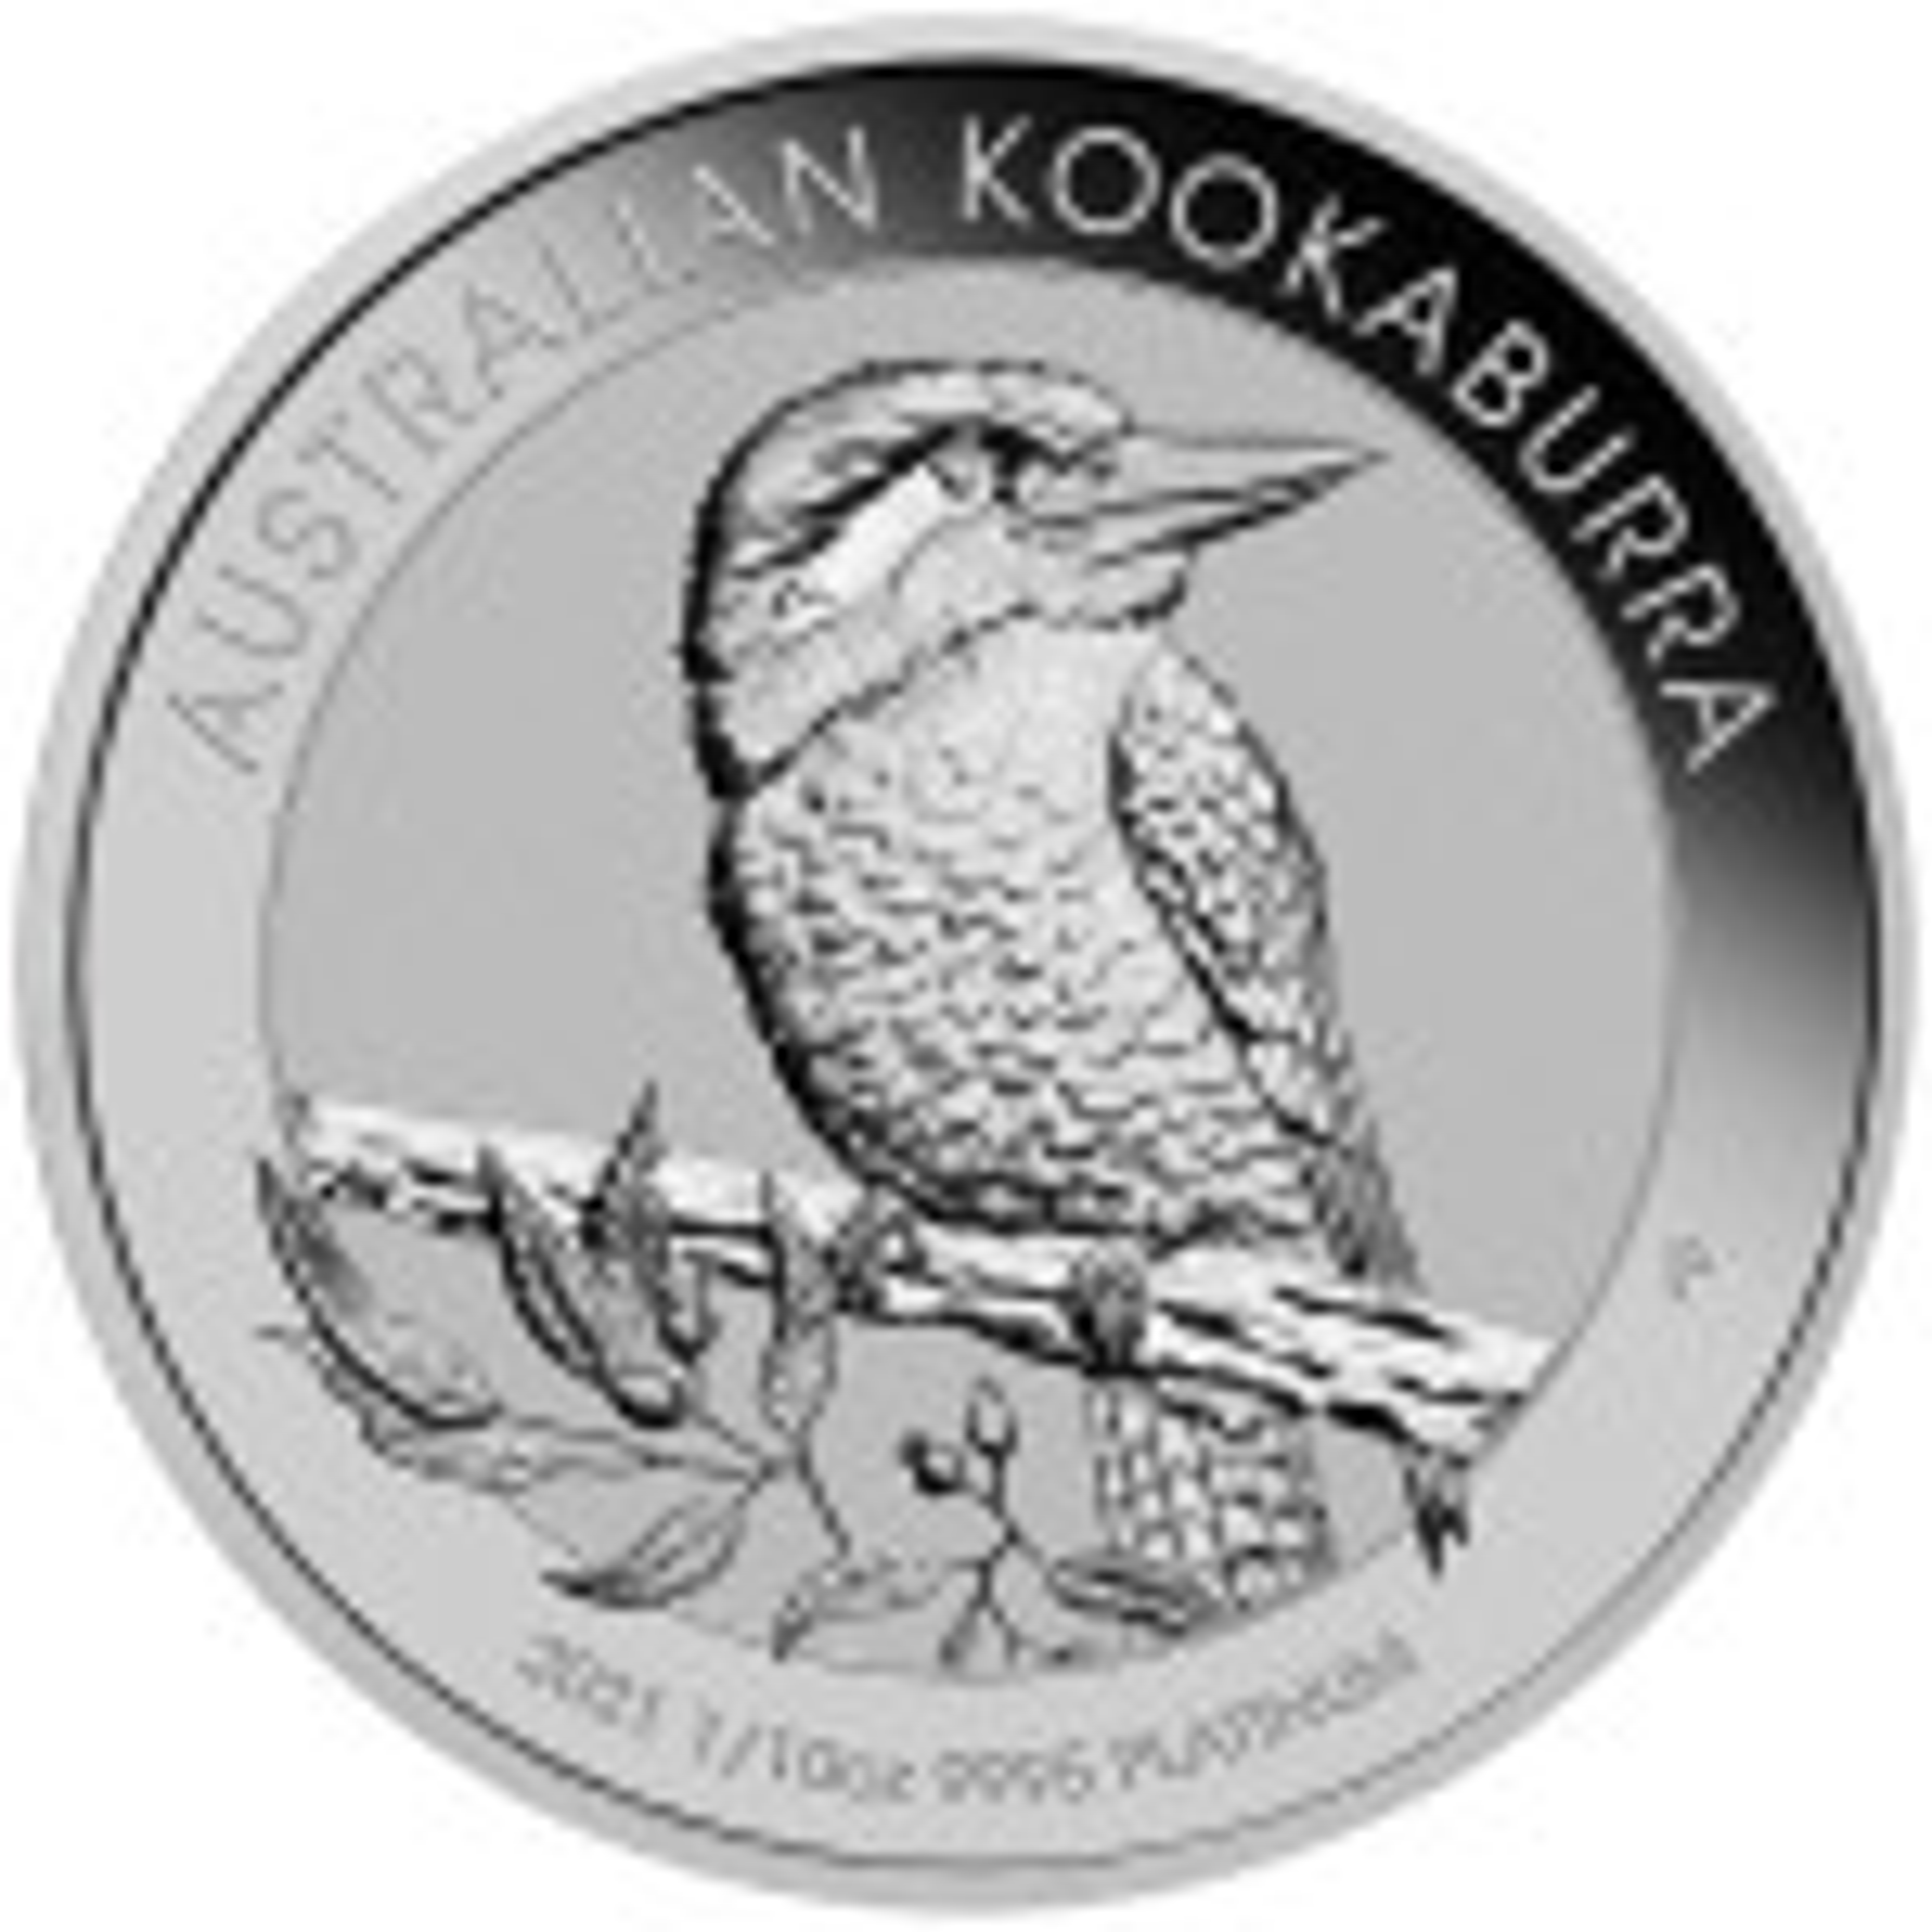 Kookaburra munt 2021 van 1/10 troy ounce platina